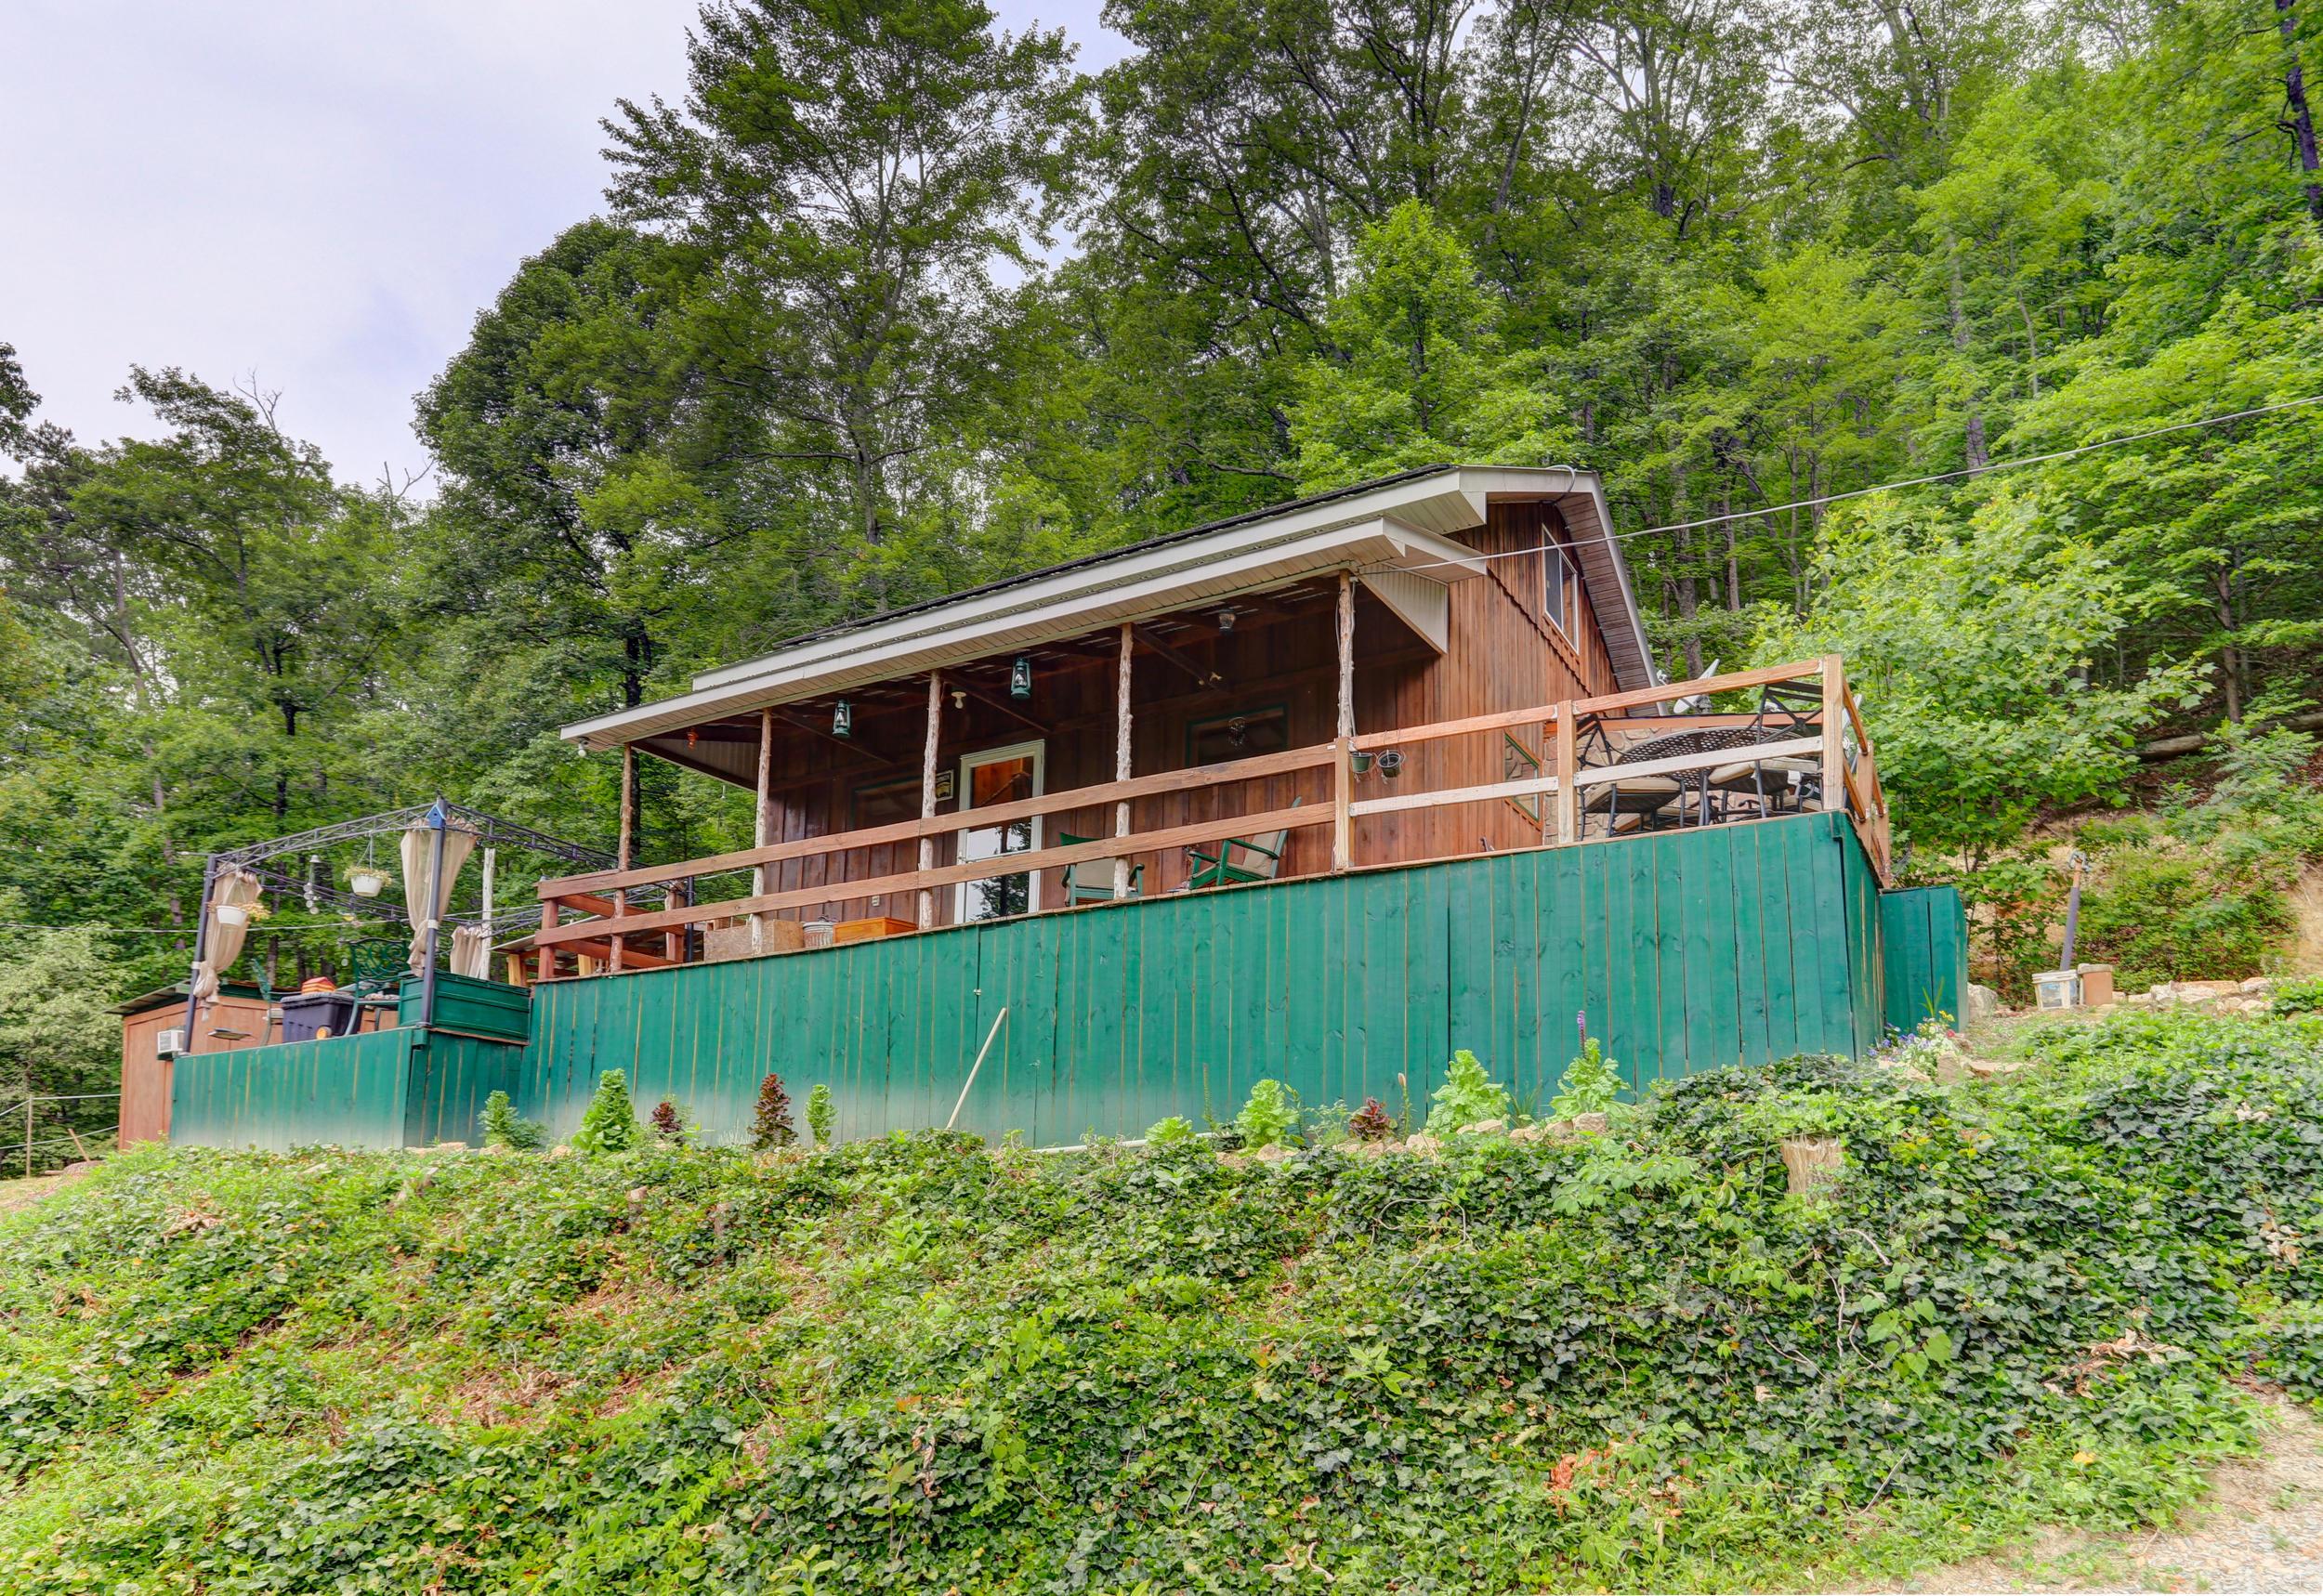 1018 Cloud Creek Rd, Rogersville, Tennessee 37857, 1 Bedroom Bedrooms, ,1 BathroomBathrooms,Single Family,For Sale,Cloud Creek,1082431